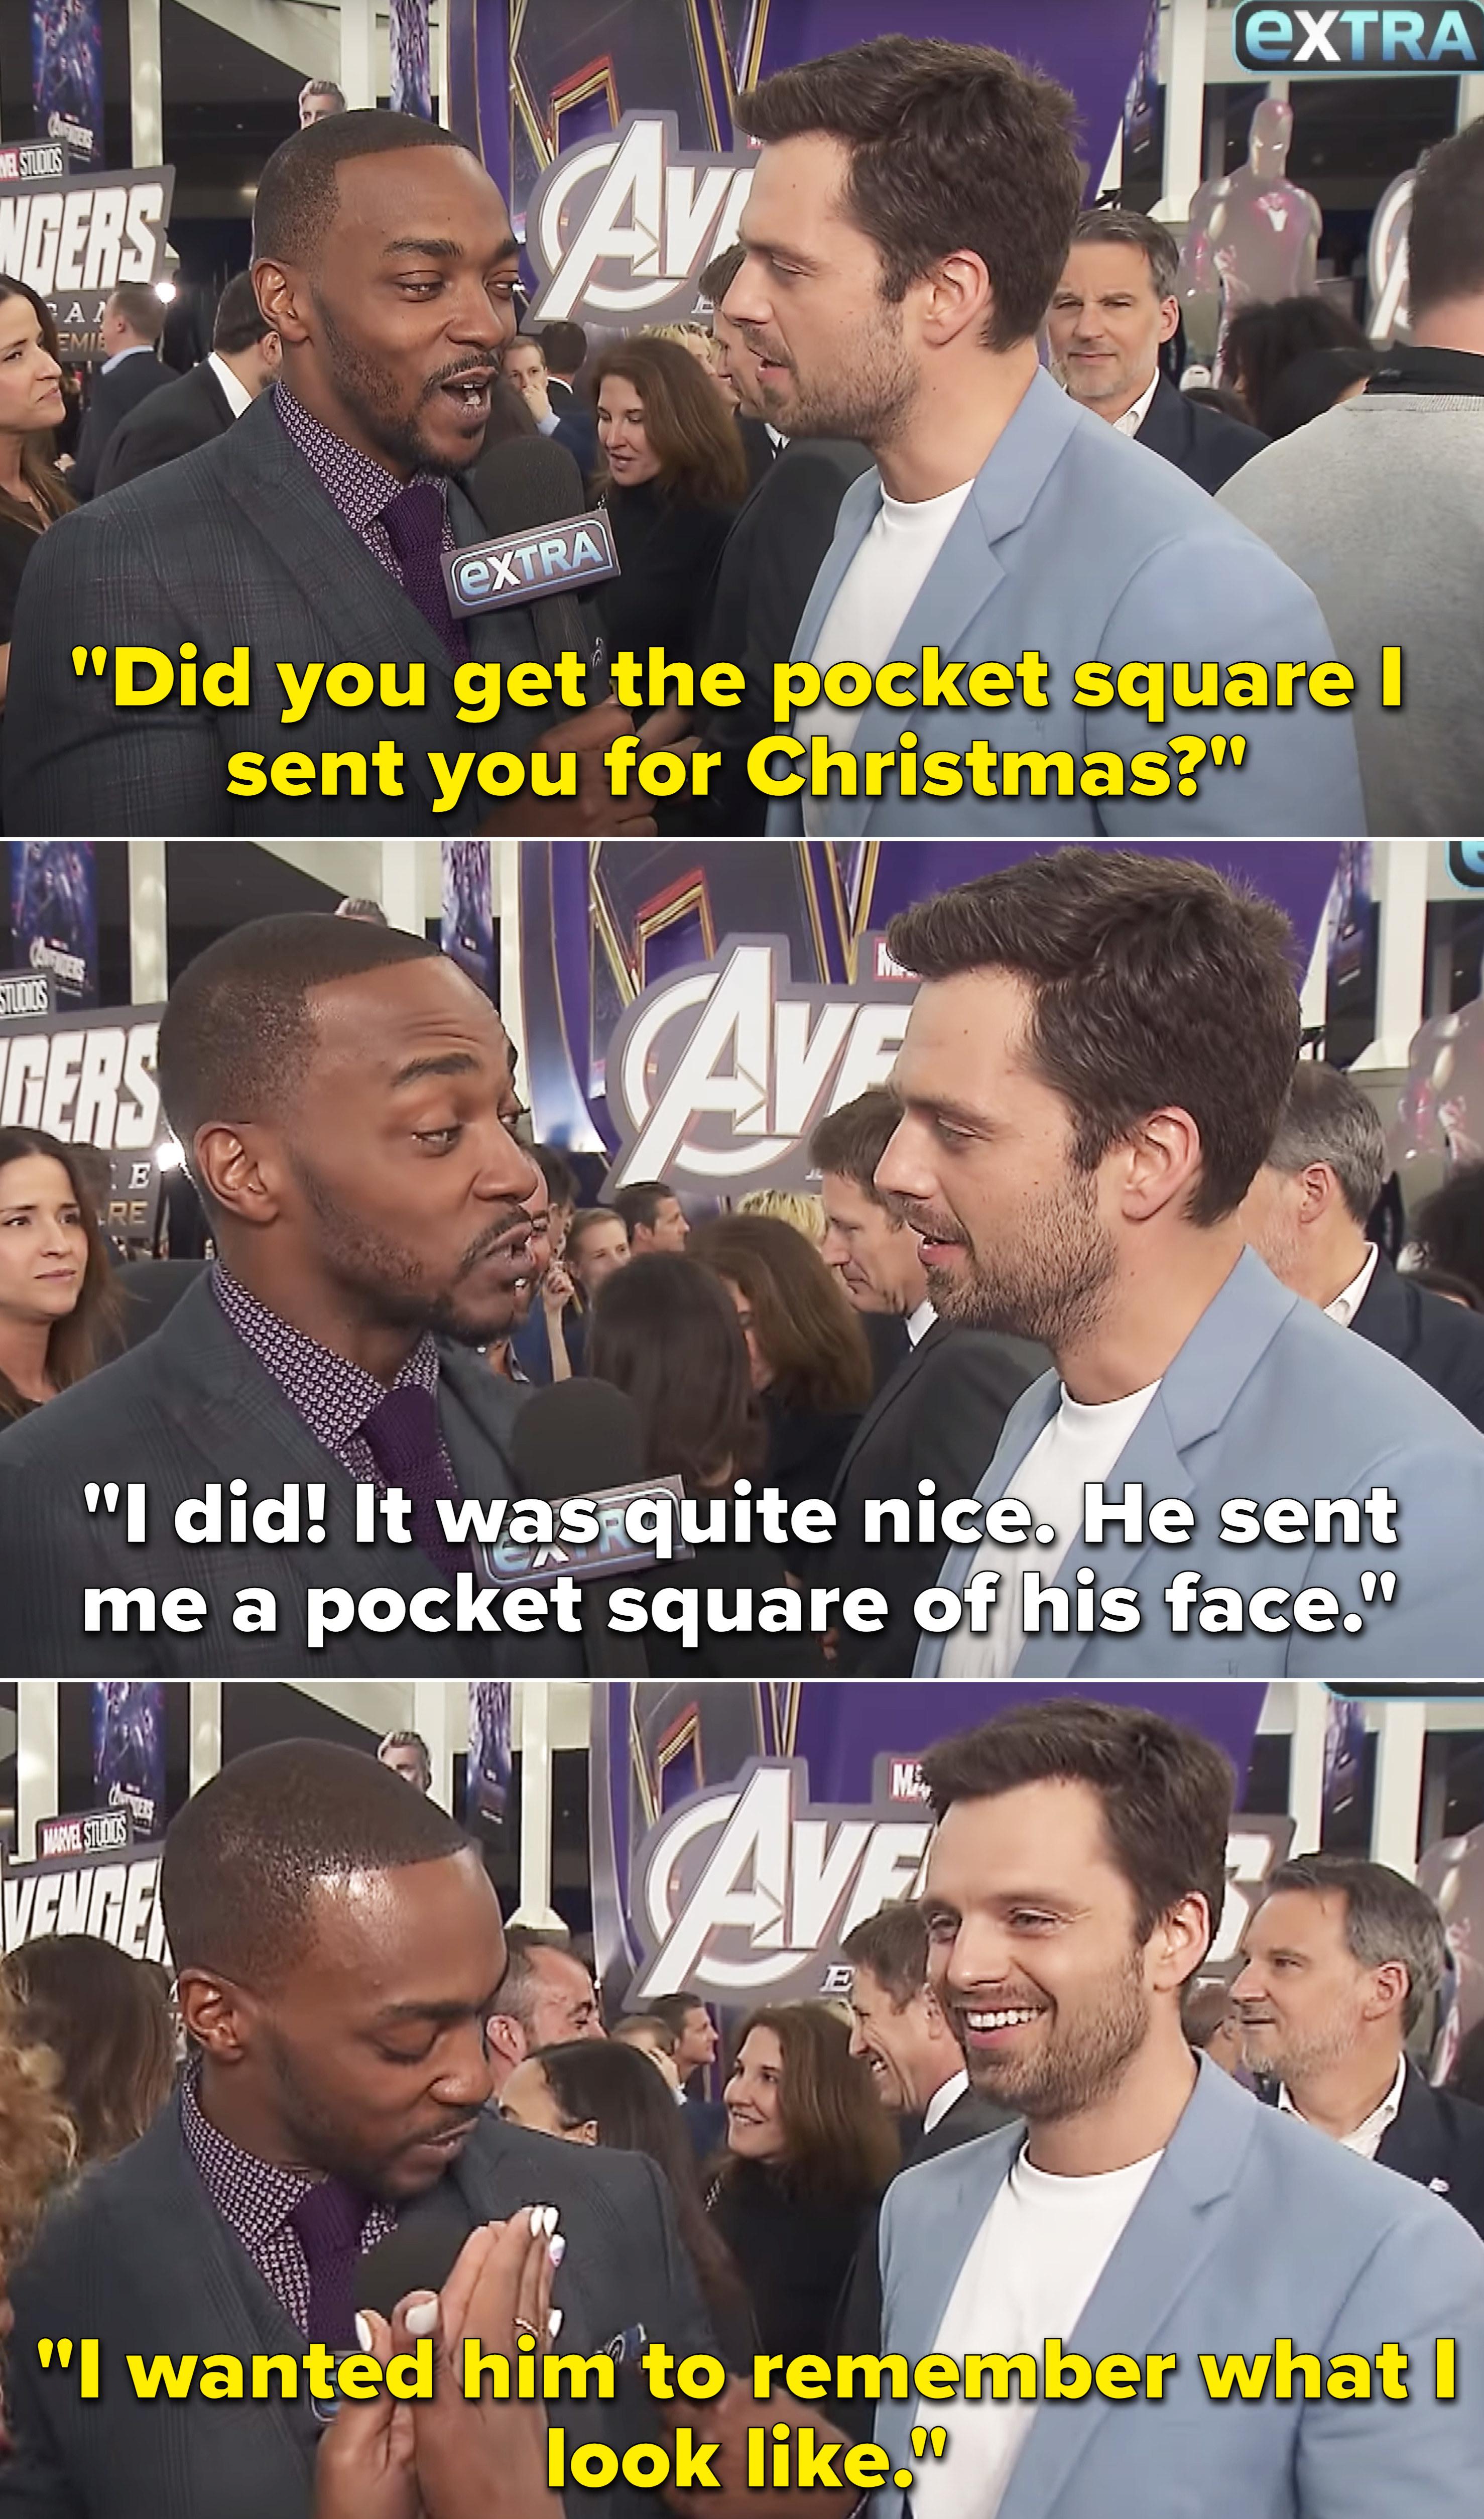 Sebastian asking Anthony if he got the pocket square he sent him for Christmas